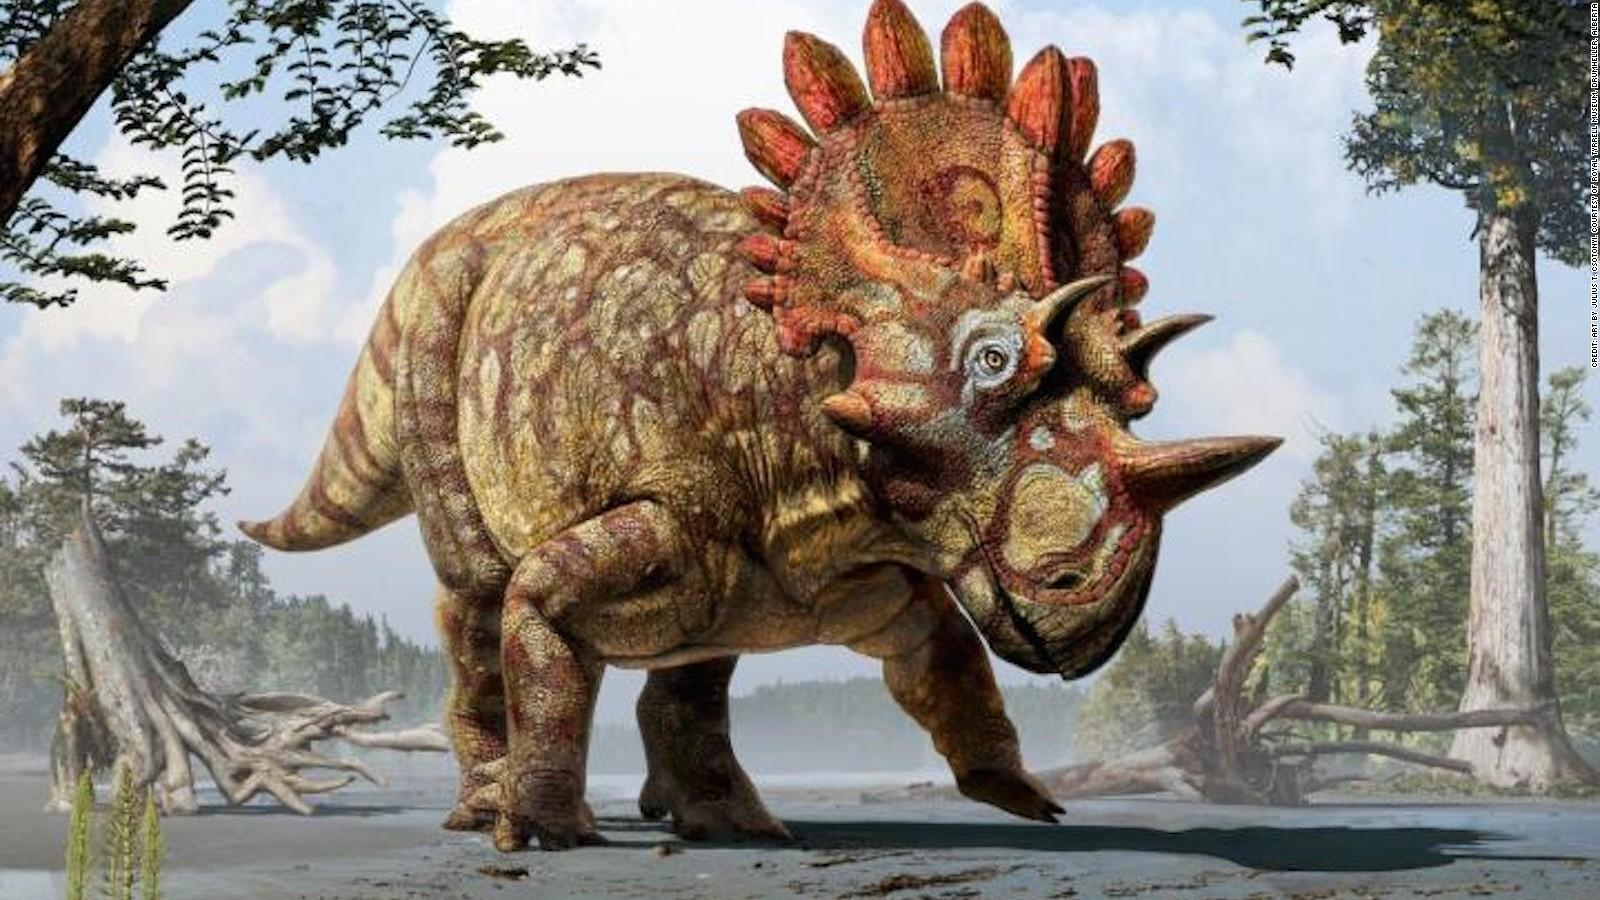 hellboy dinosaur is like triceratops only frillier cnn com